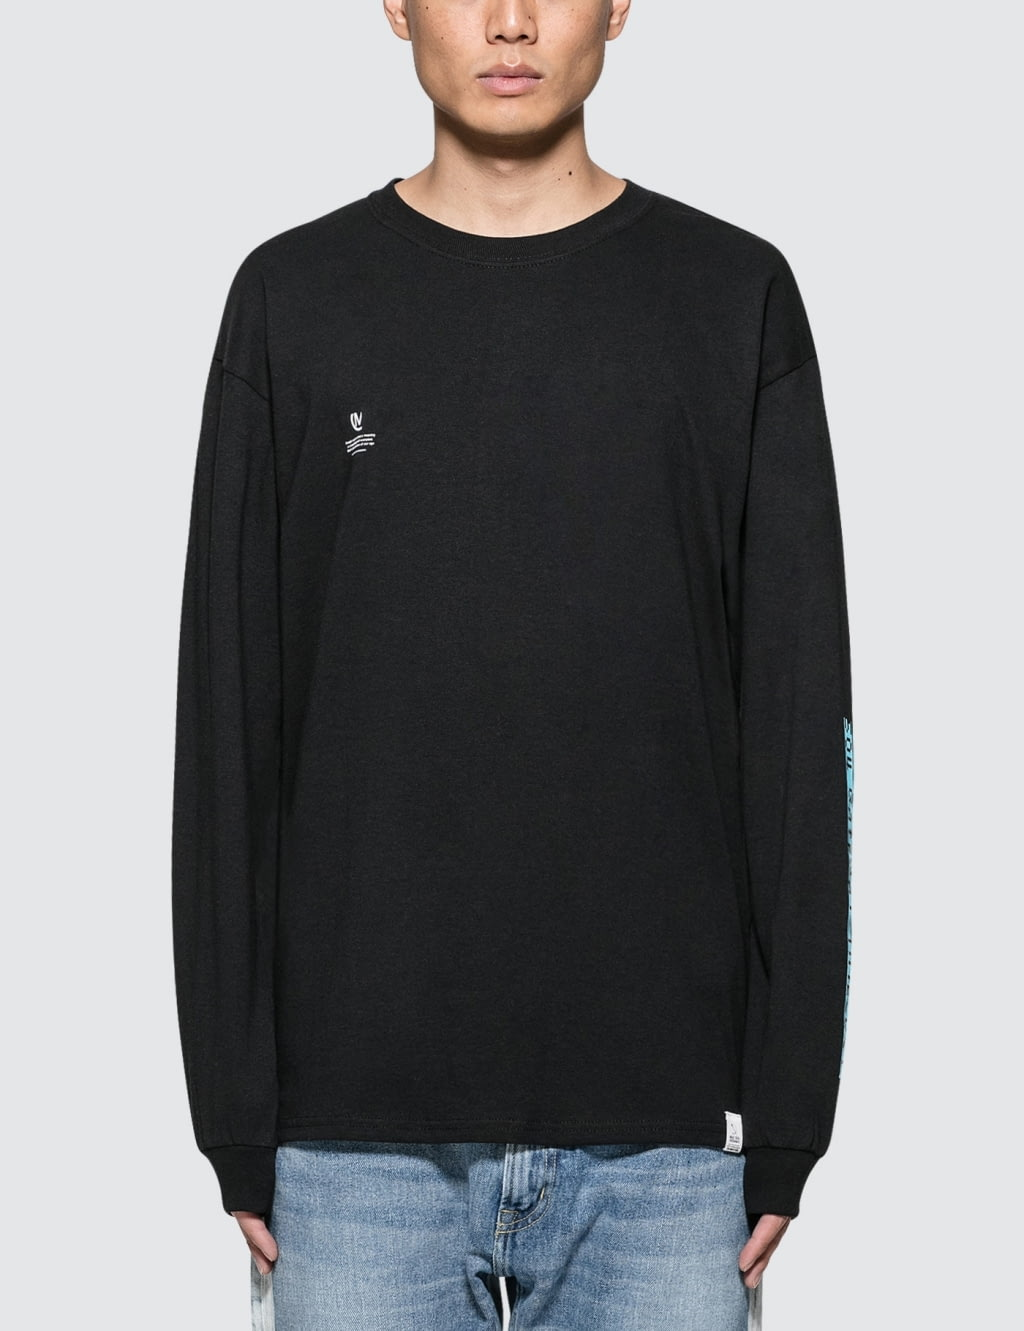 Buy Original Magic Stick 504 Gate Way L S T Shirt At Indonesia Baju Kaos Singlet Tanktop Fashion Pria